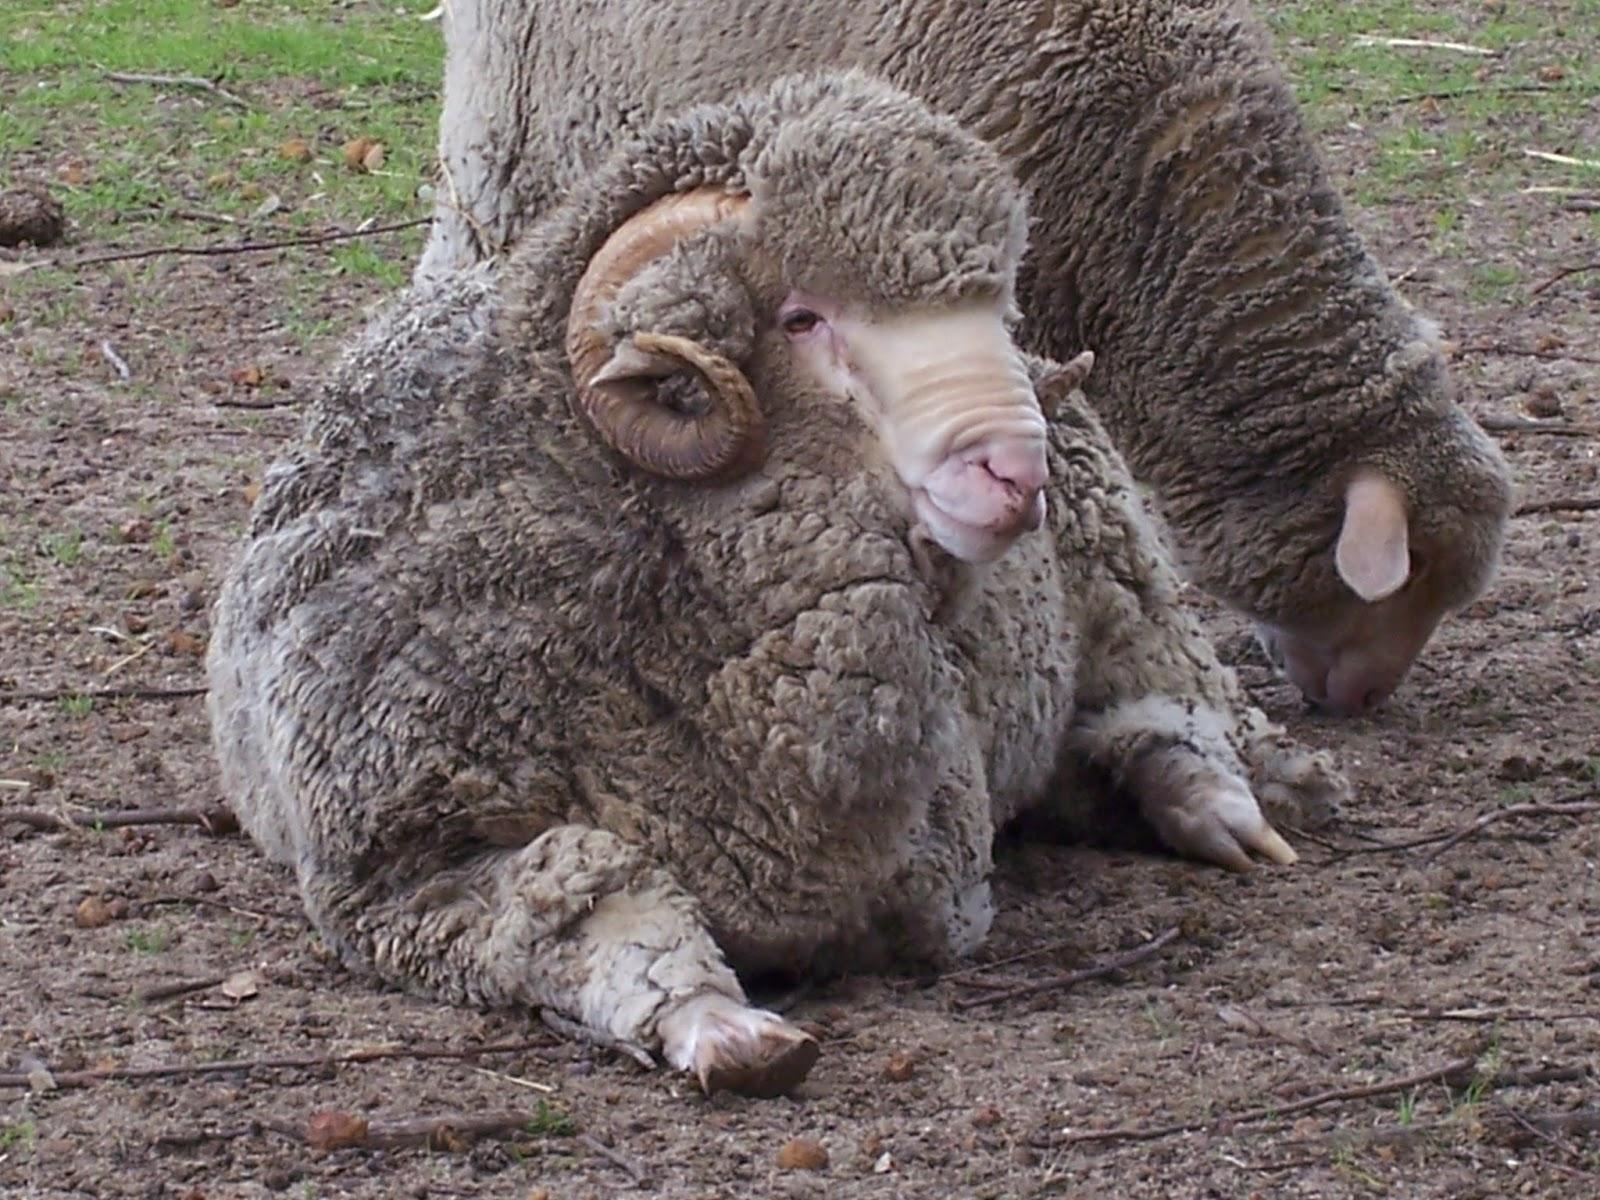 Pretending to Farm: The Art of Raising Orphaned Lambs